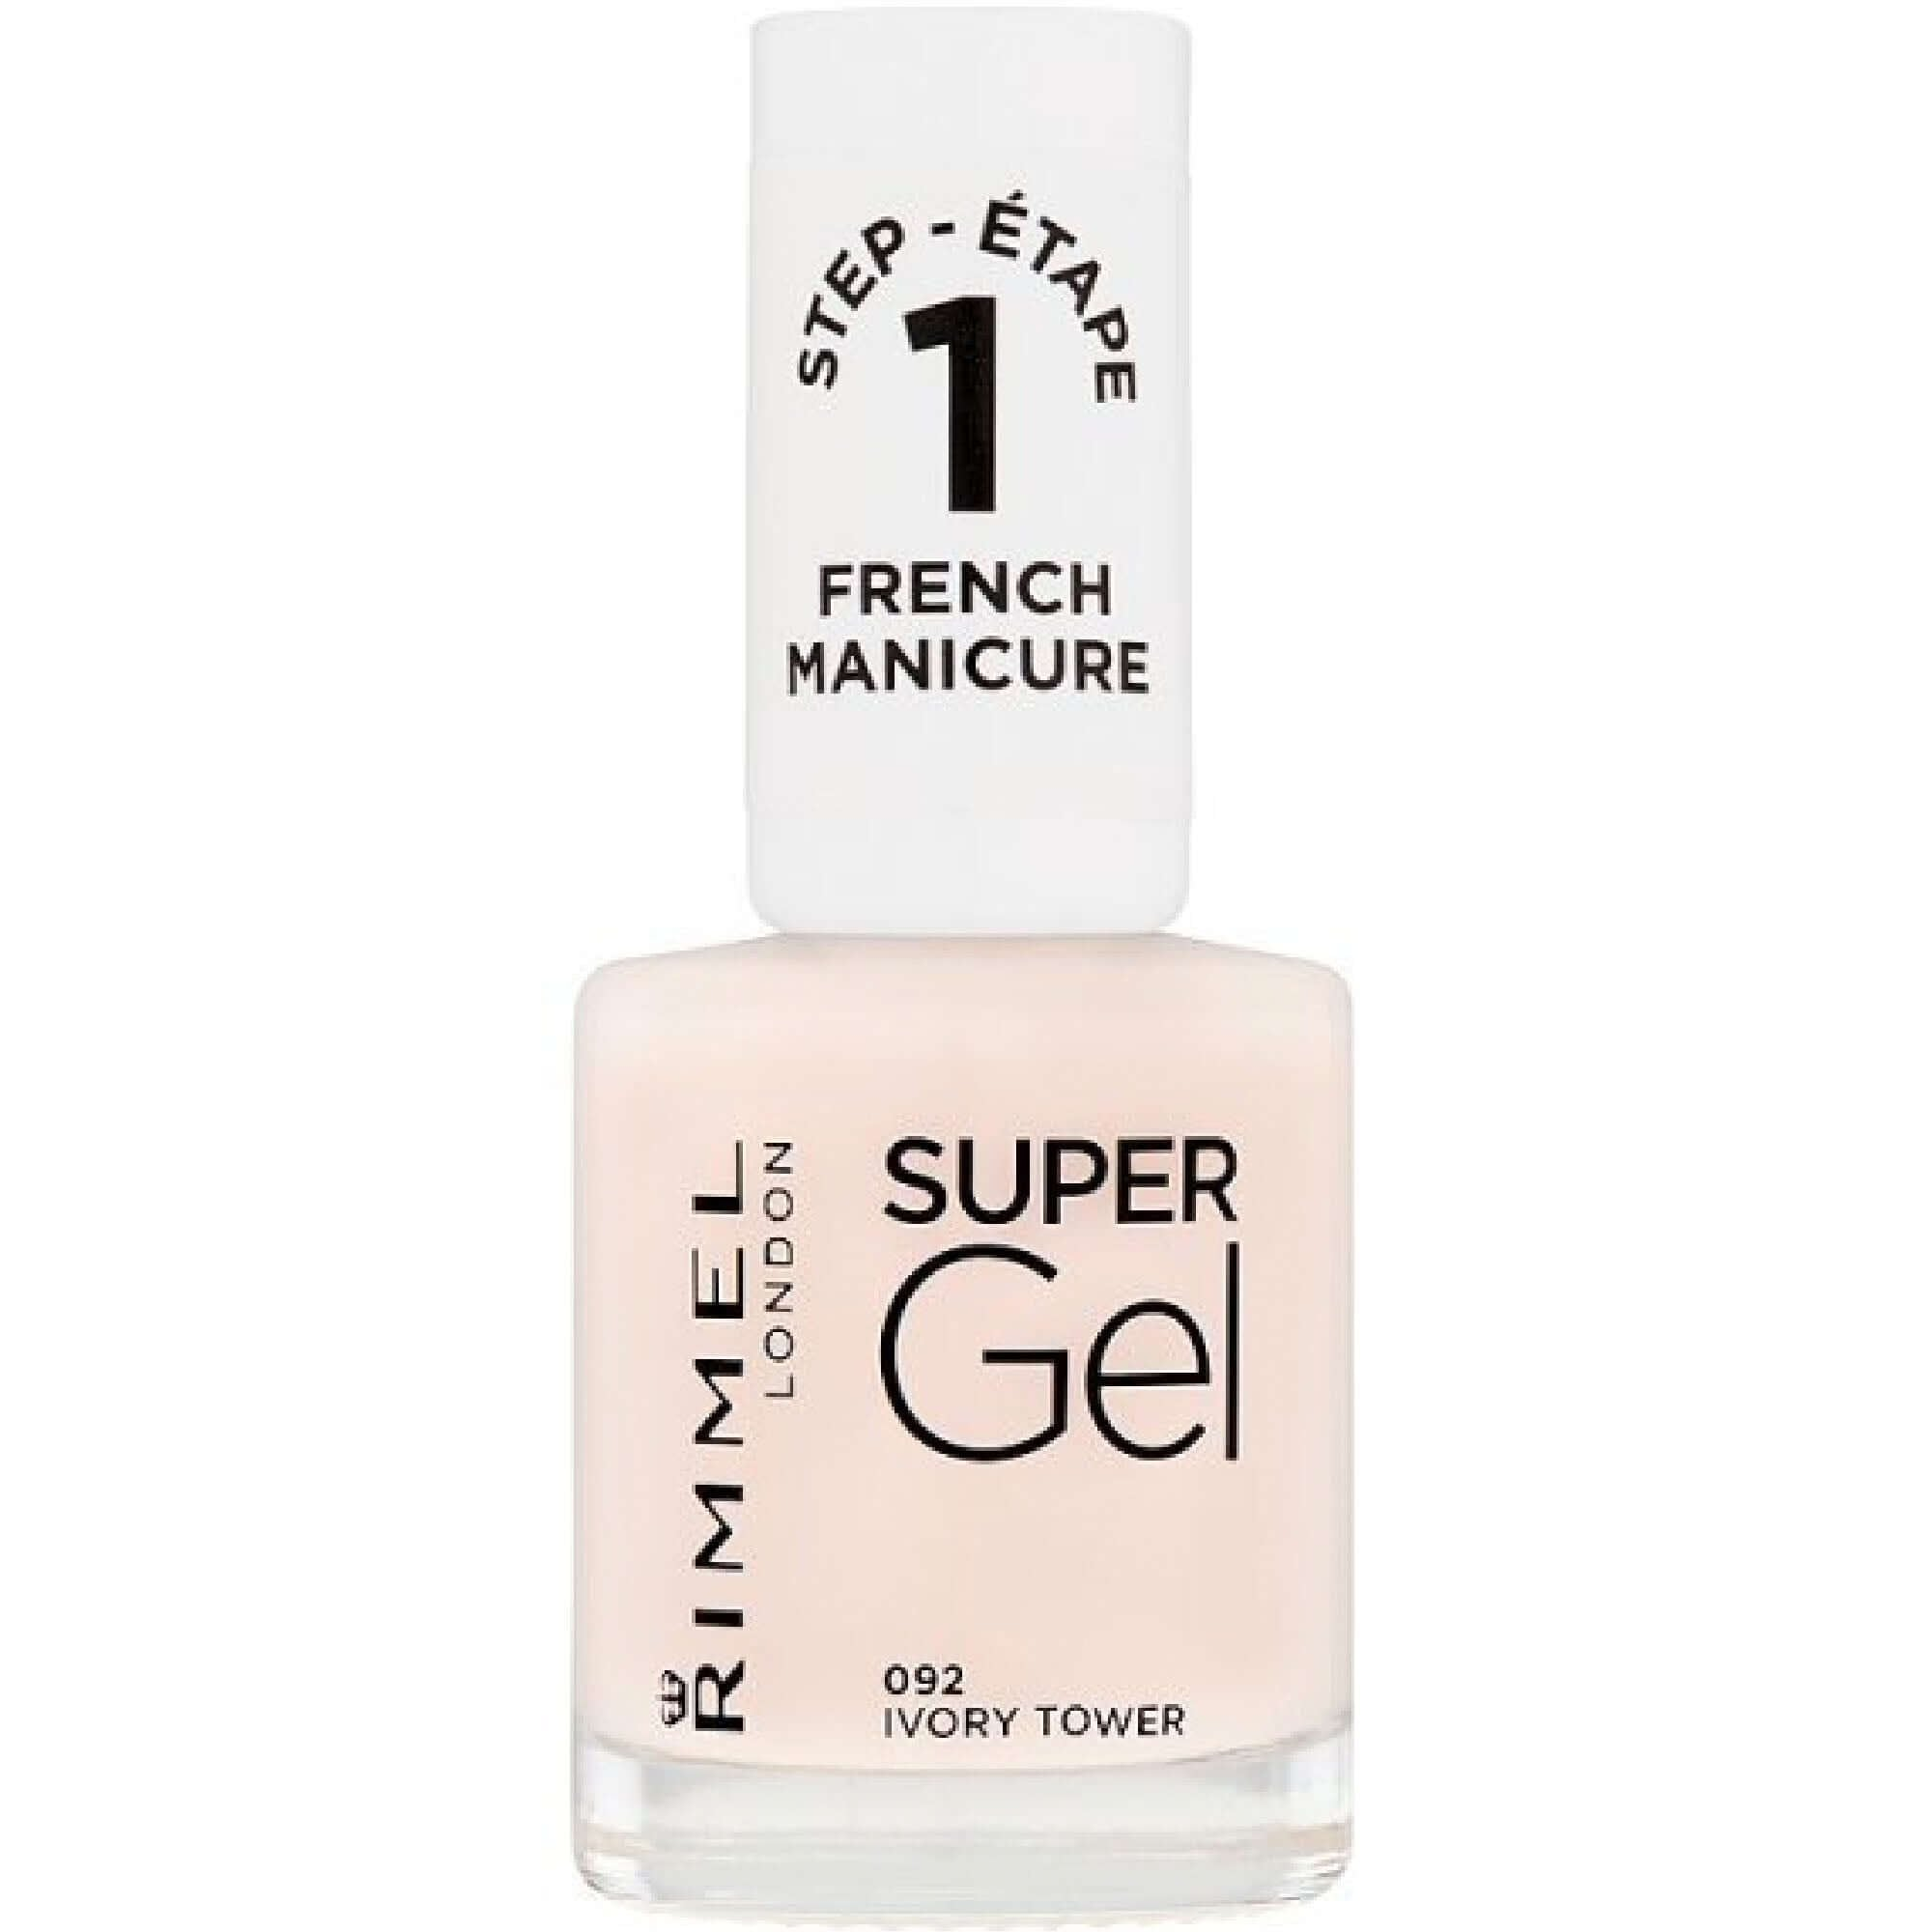 Rimmel London Super Gel Colour Nail Polish - Ivory Tower (092) 12ml